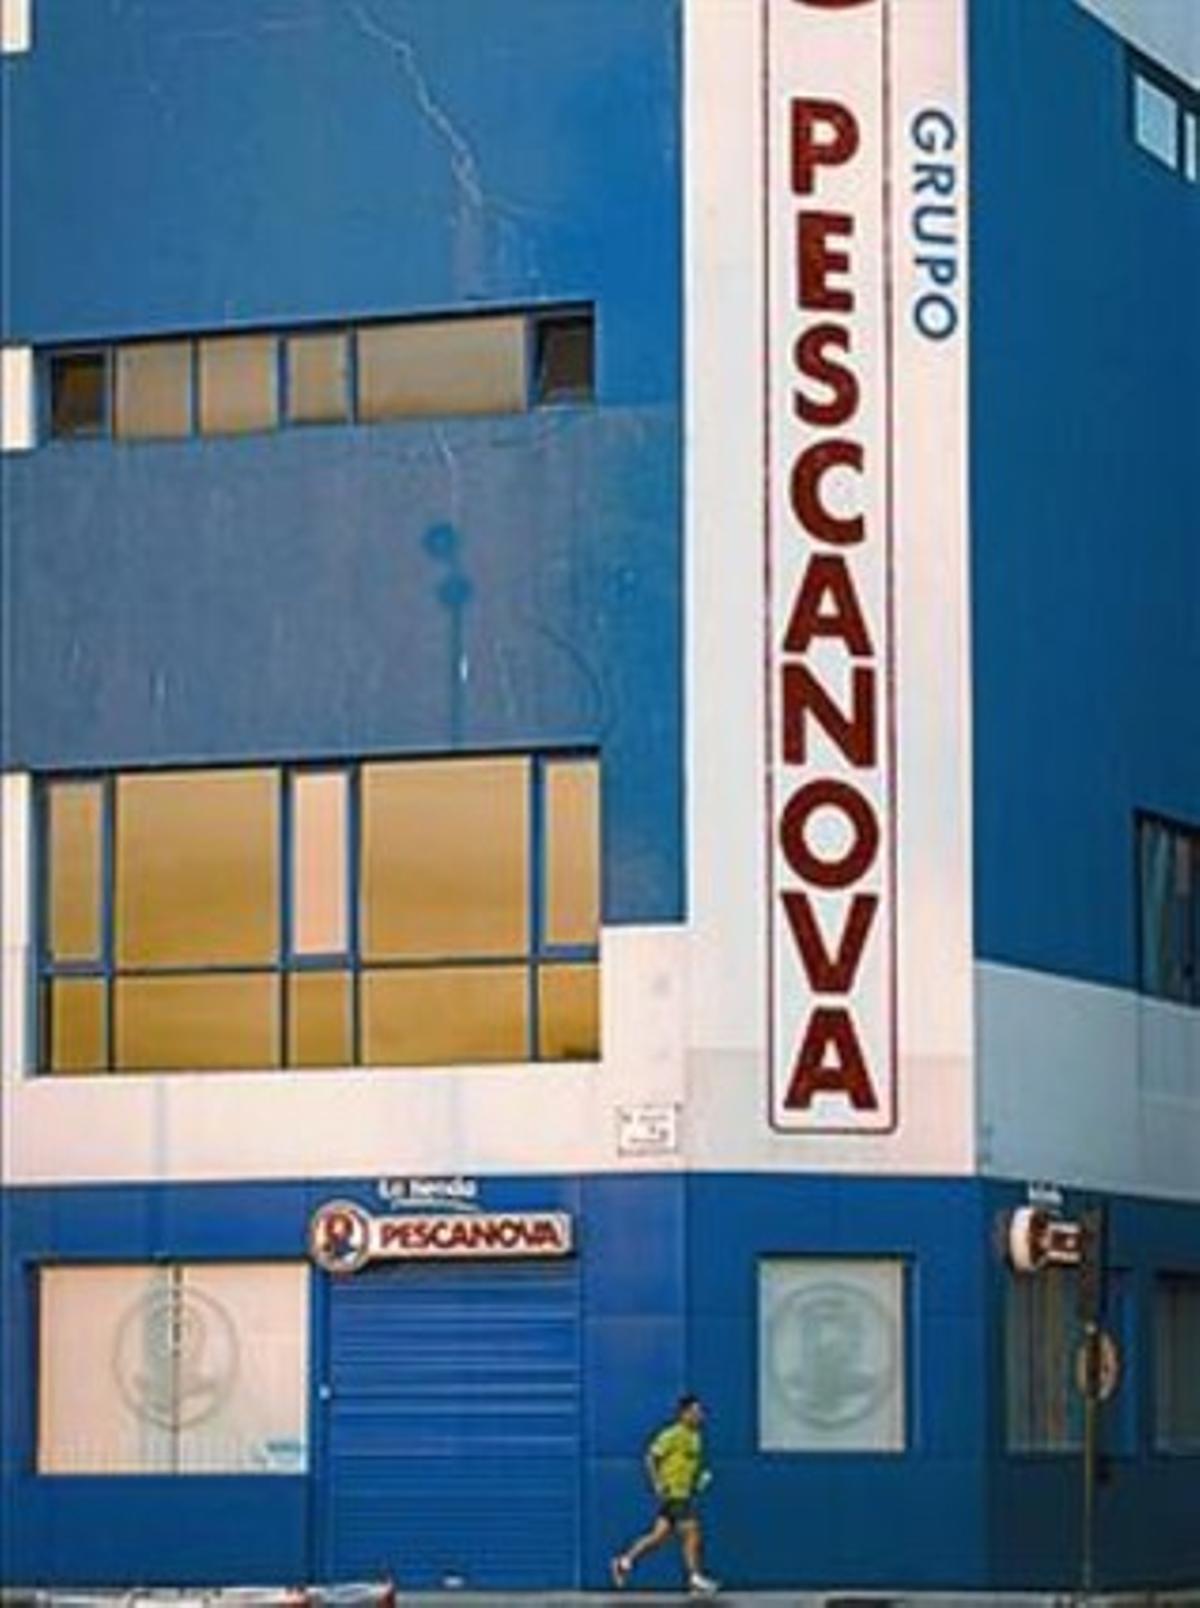 La sede de Pescanova